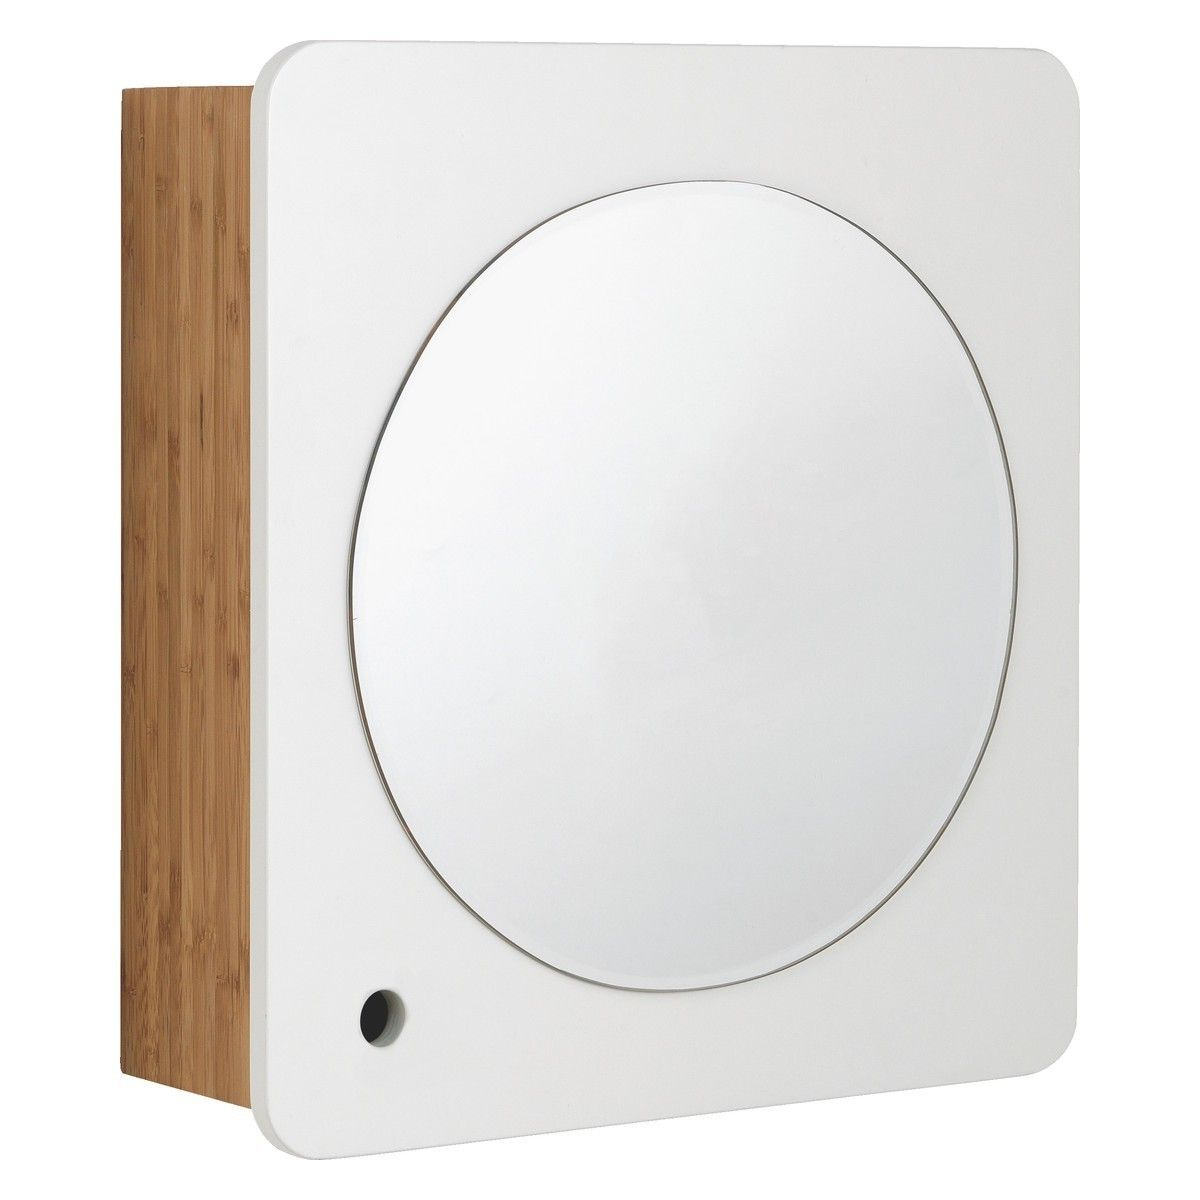 ODIN Bamboo bathroom cabinet with mirror from Habitat Bathroom ...